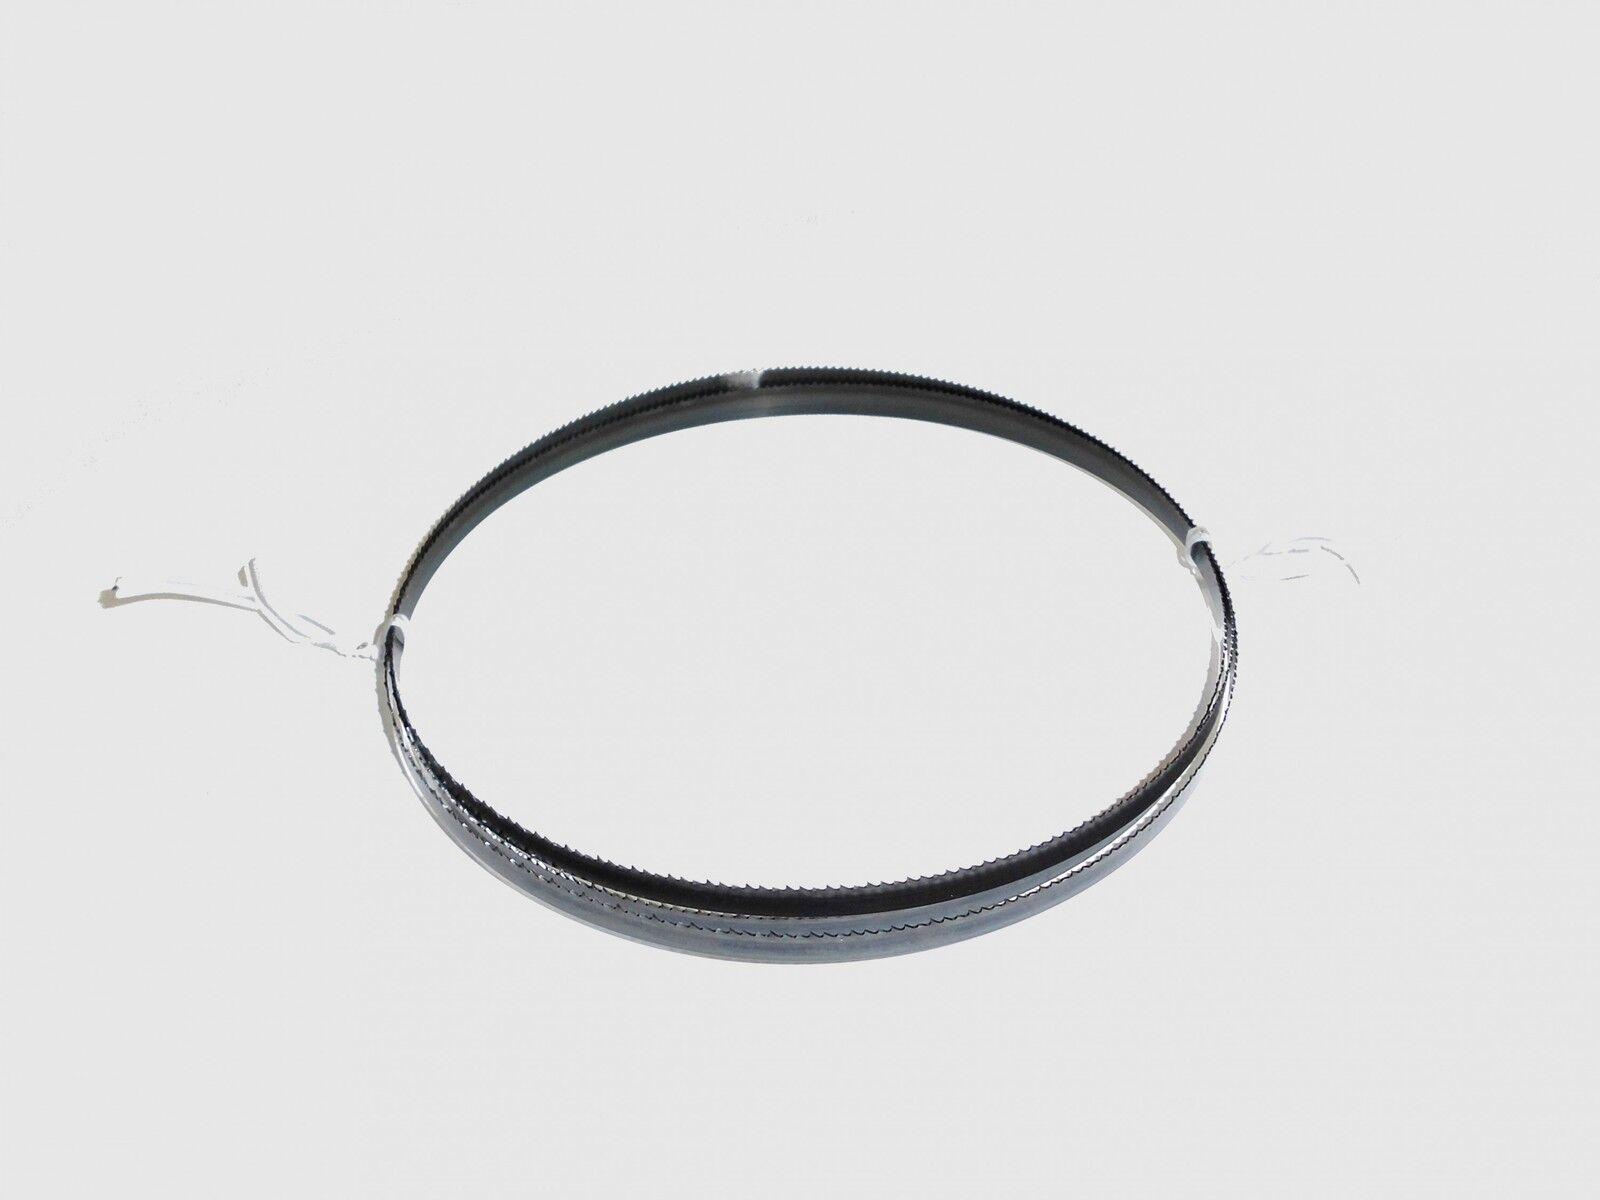 1 X Sägeband Bandsägeblatt 1400 X 6 X 0,36 Mm 14 Zpz Metall Atika Einhell